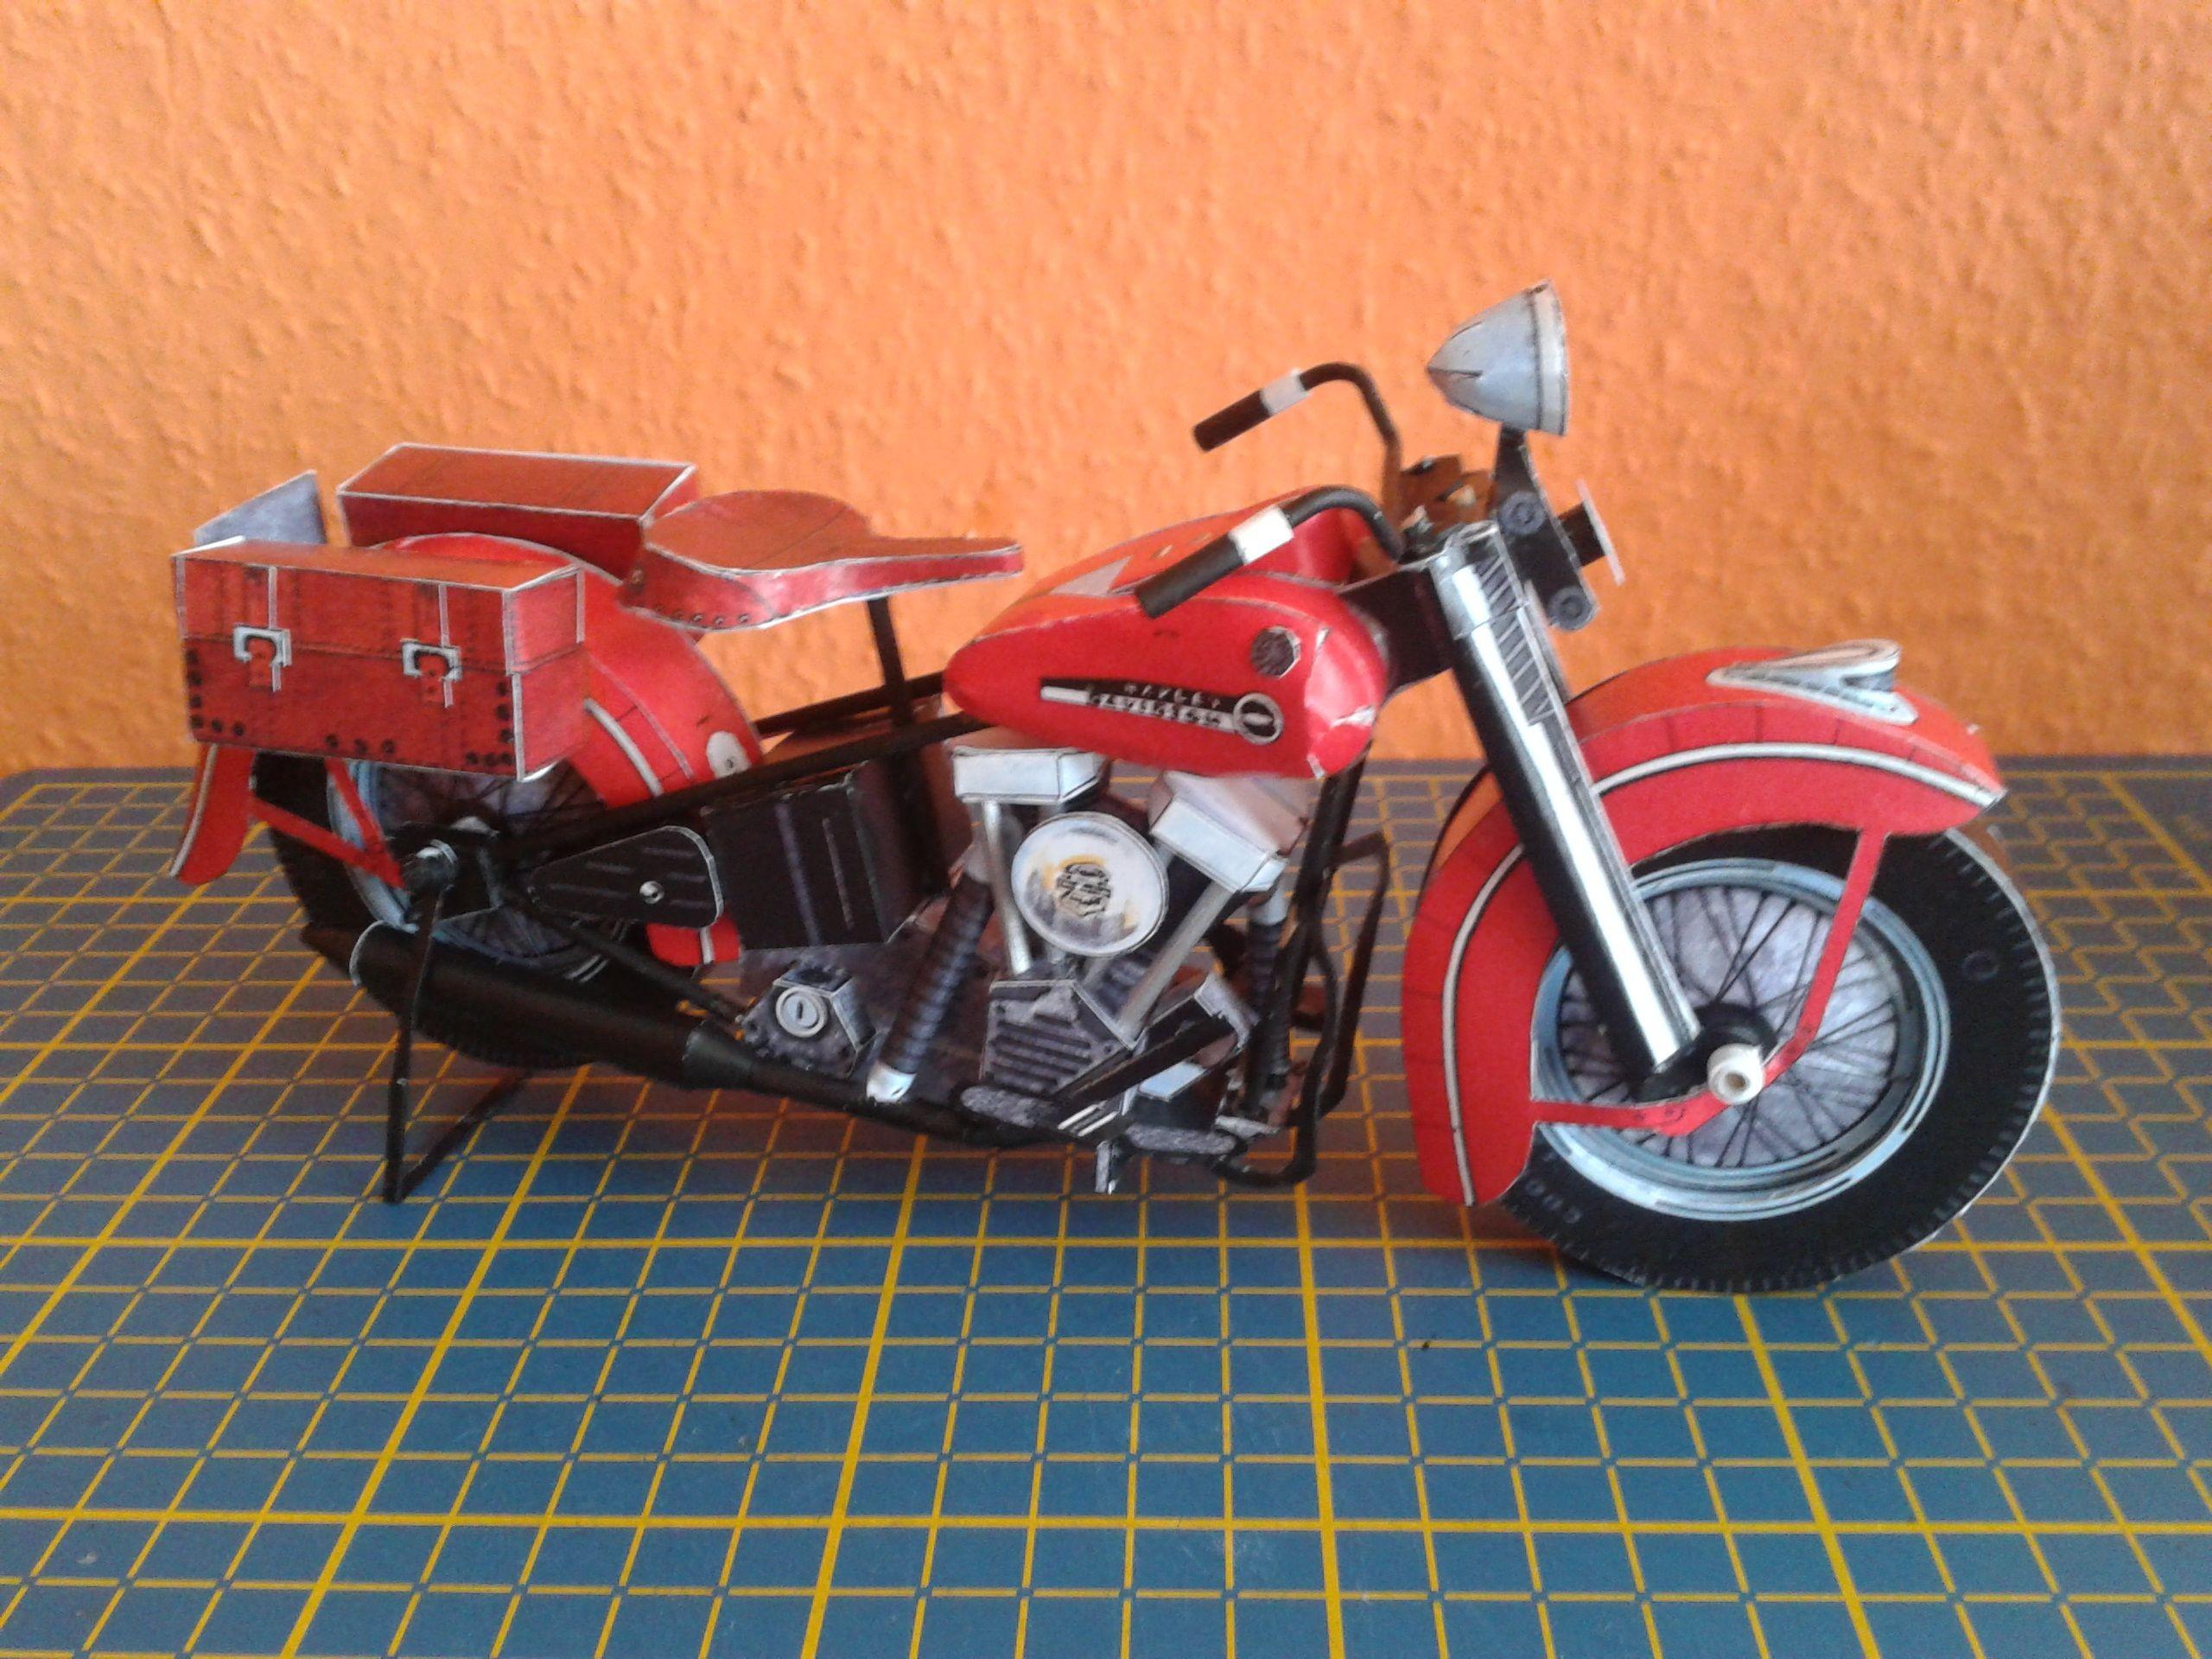 Papercraft Motorcycle Yamaha Papercraft Yamaha Yz450f 450 °f = 232 °c Motorcycle Free